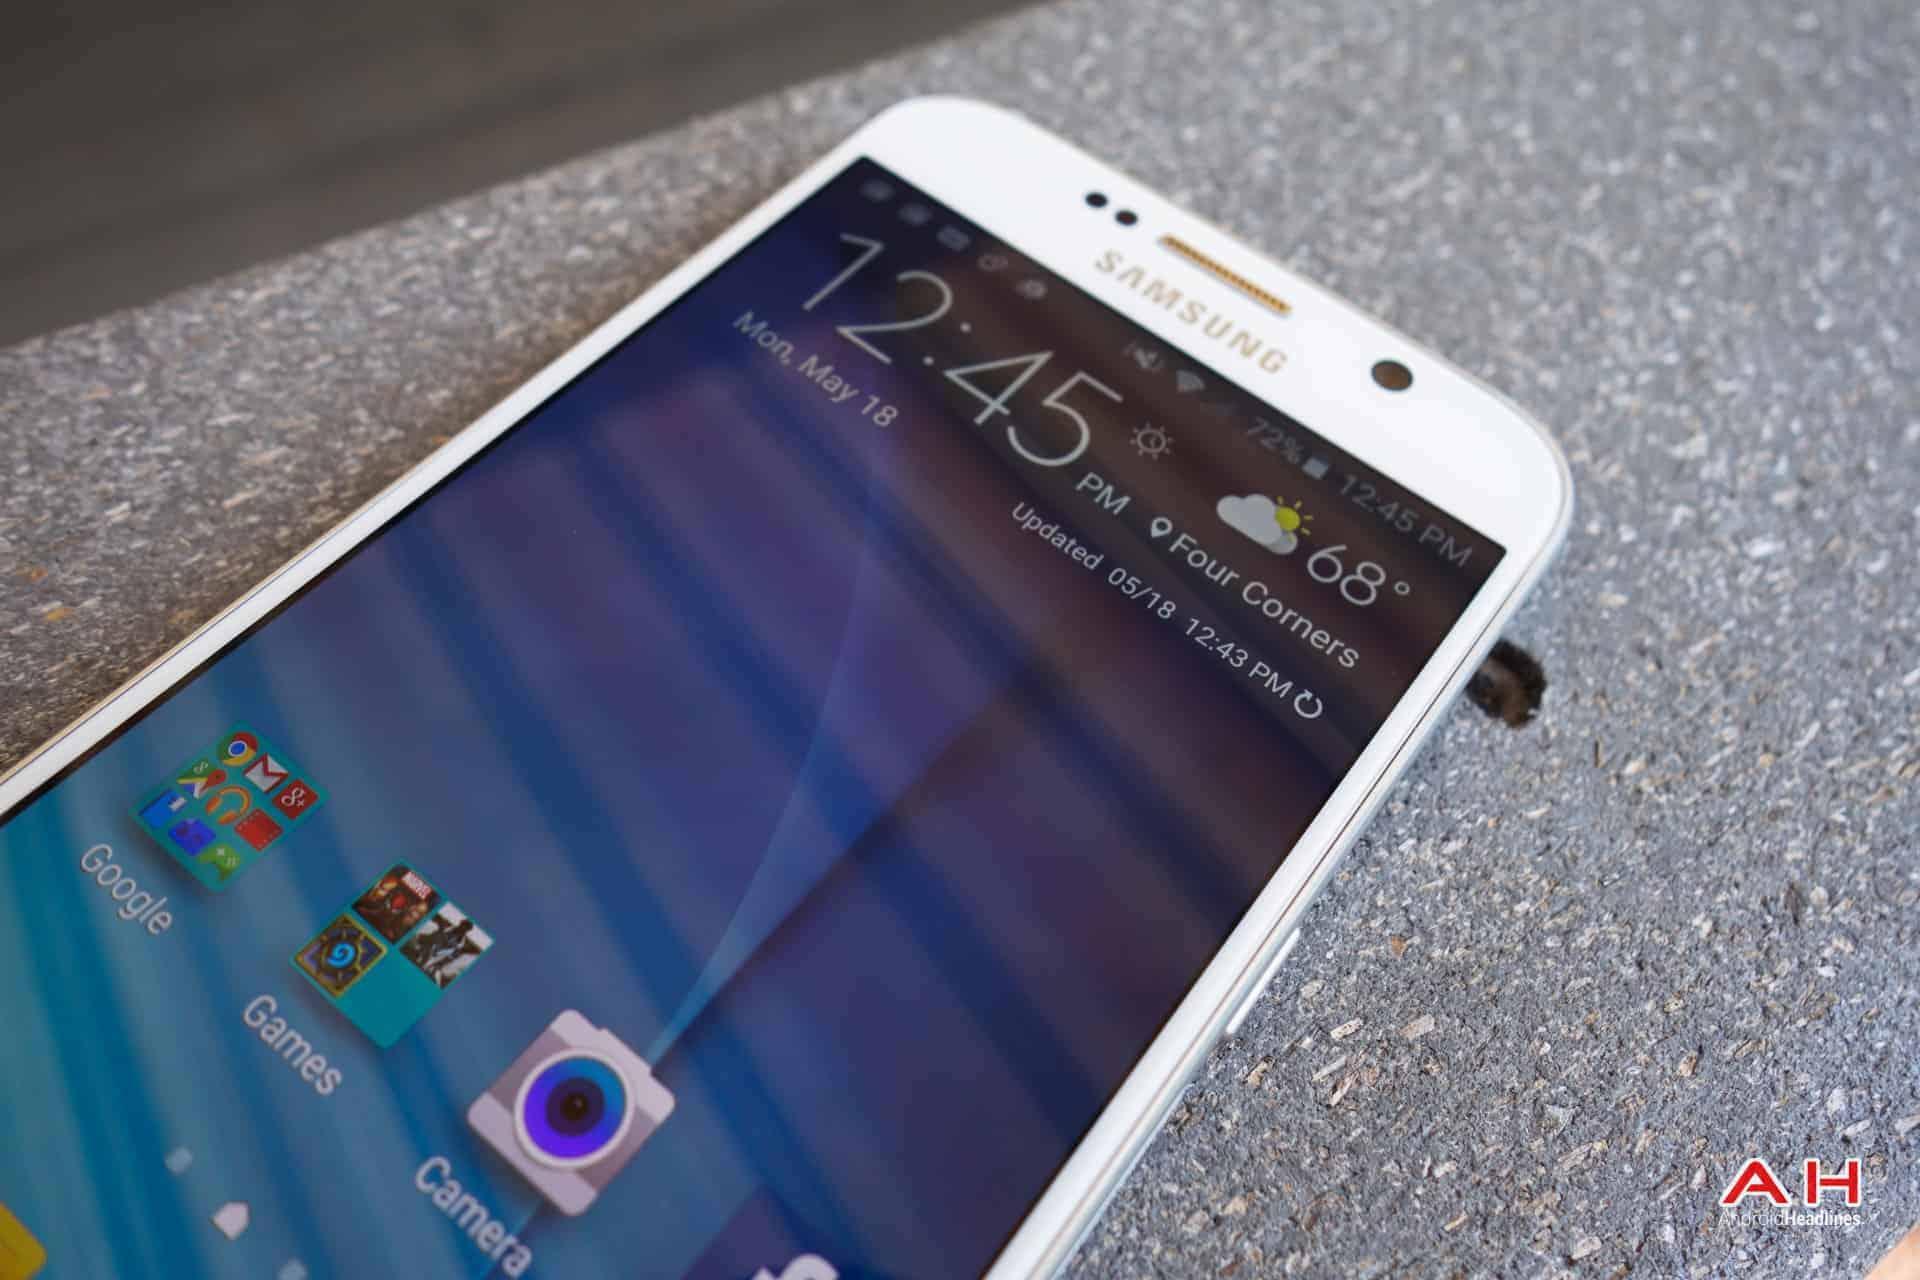 AH Samsung Galaxy S6 15